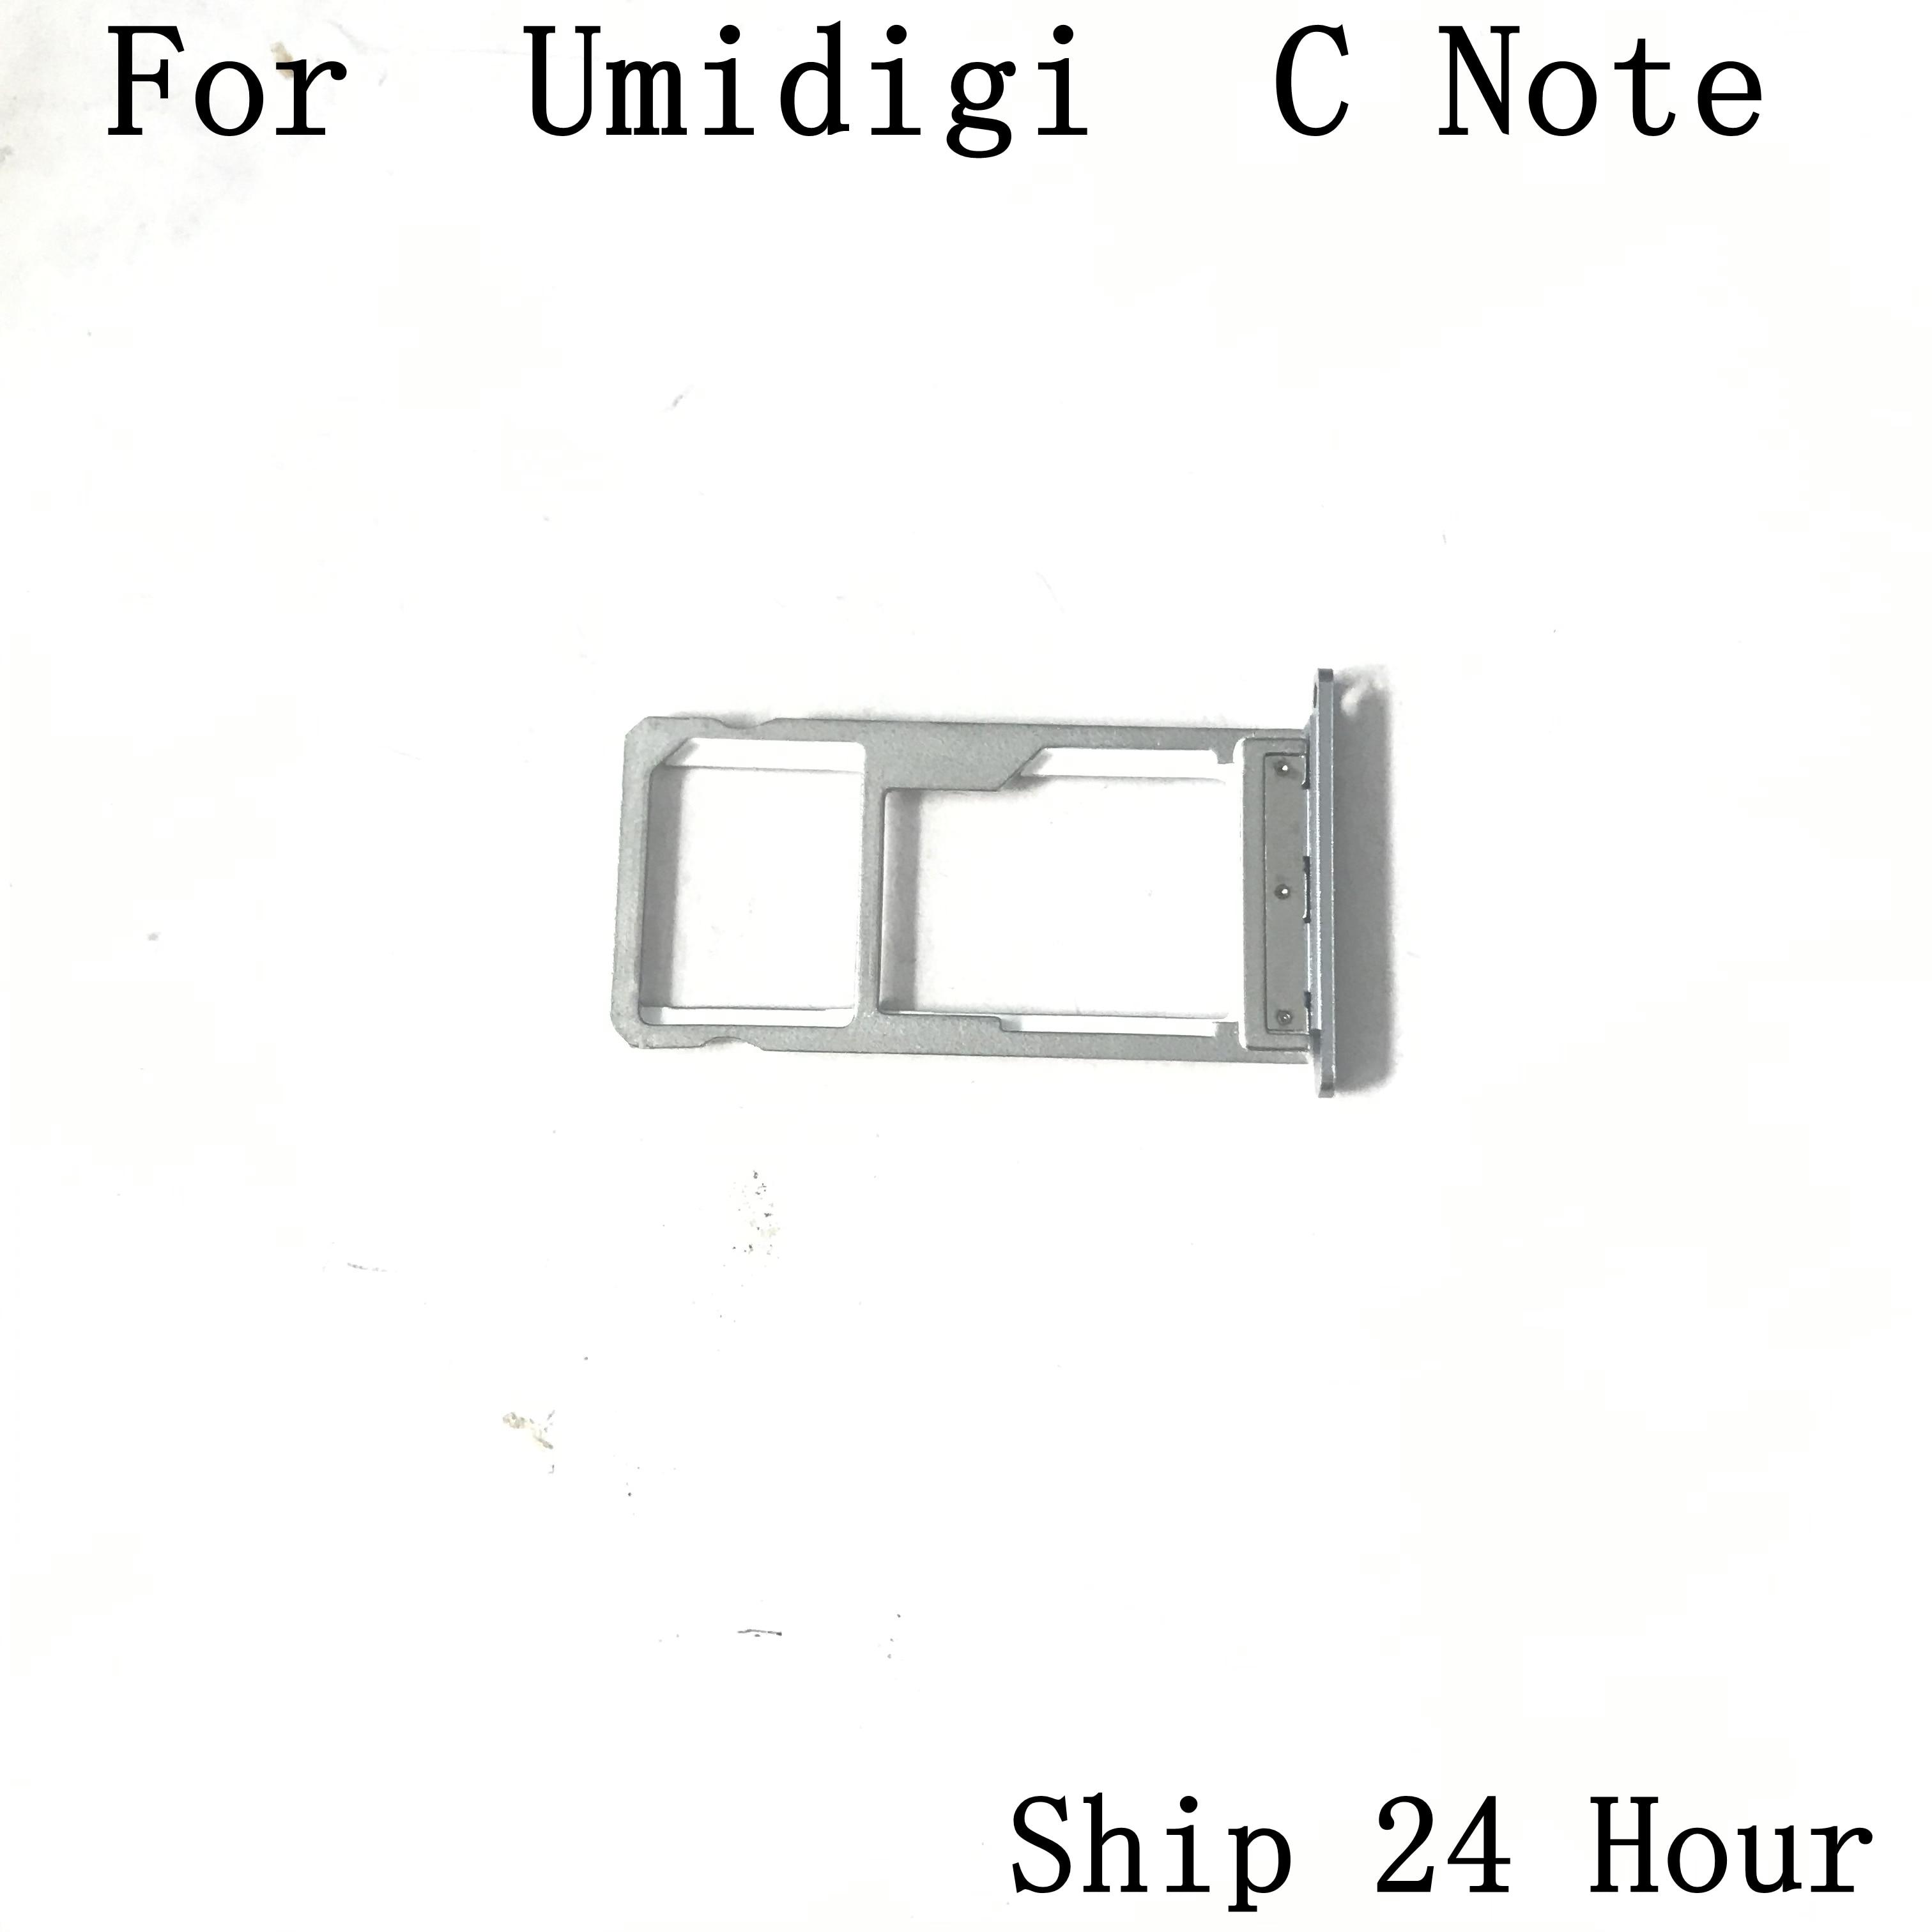 Accesorios usados de la ranura de la tarjeta de la bandeja del soporte de la tarjeta Sim para umideli C NOTE MTK6737T Quad Core 5,5 pulgadas 1920x1080